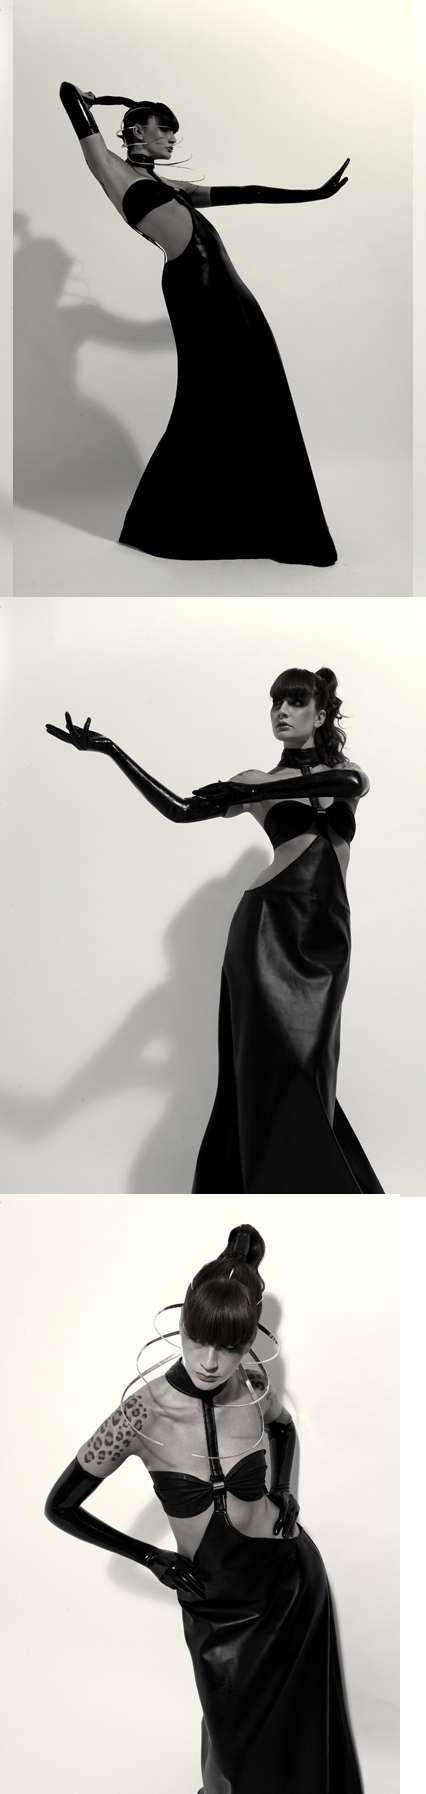 LEON Studio Nov 29, 2008 LEON Photography Model: Sharon TK, Styling by: LEON, top & head piece by; HARDWEAR by LEON